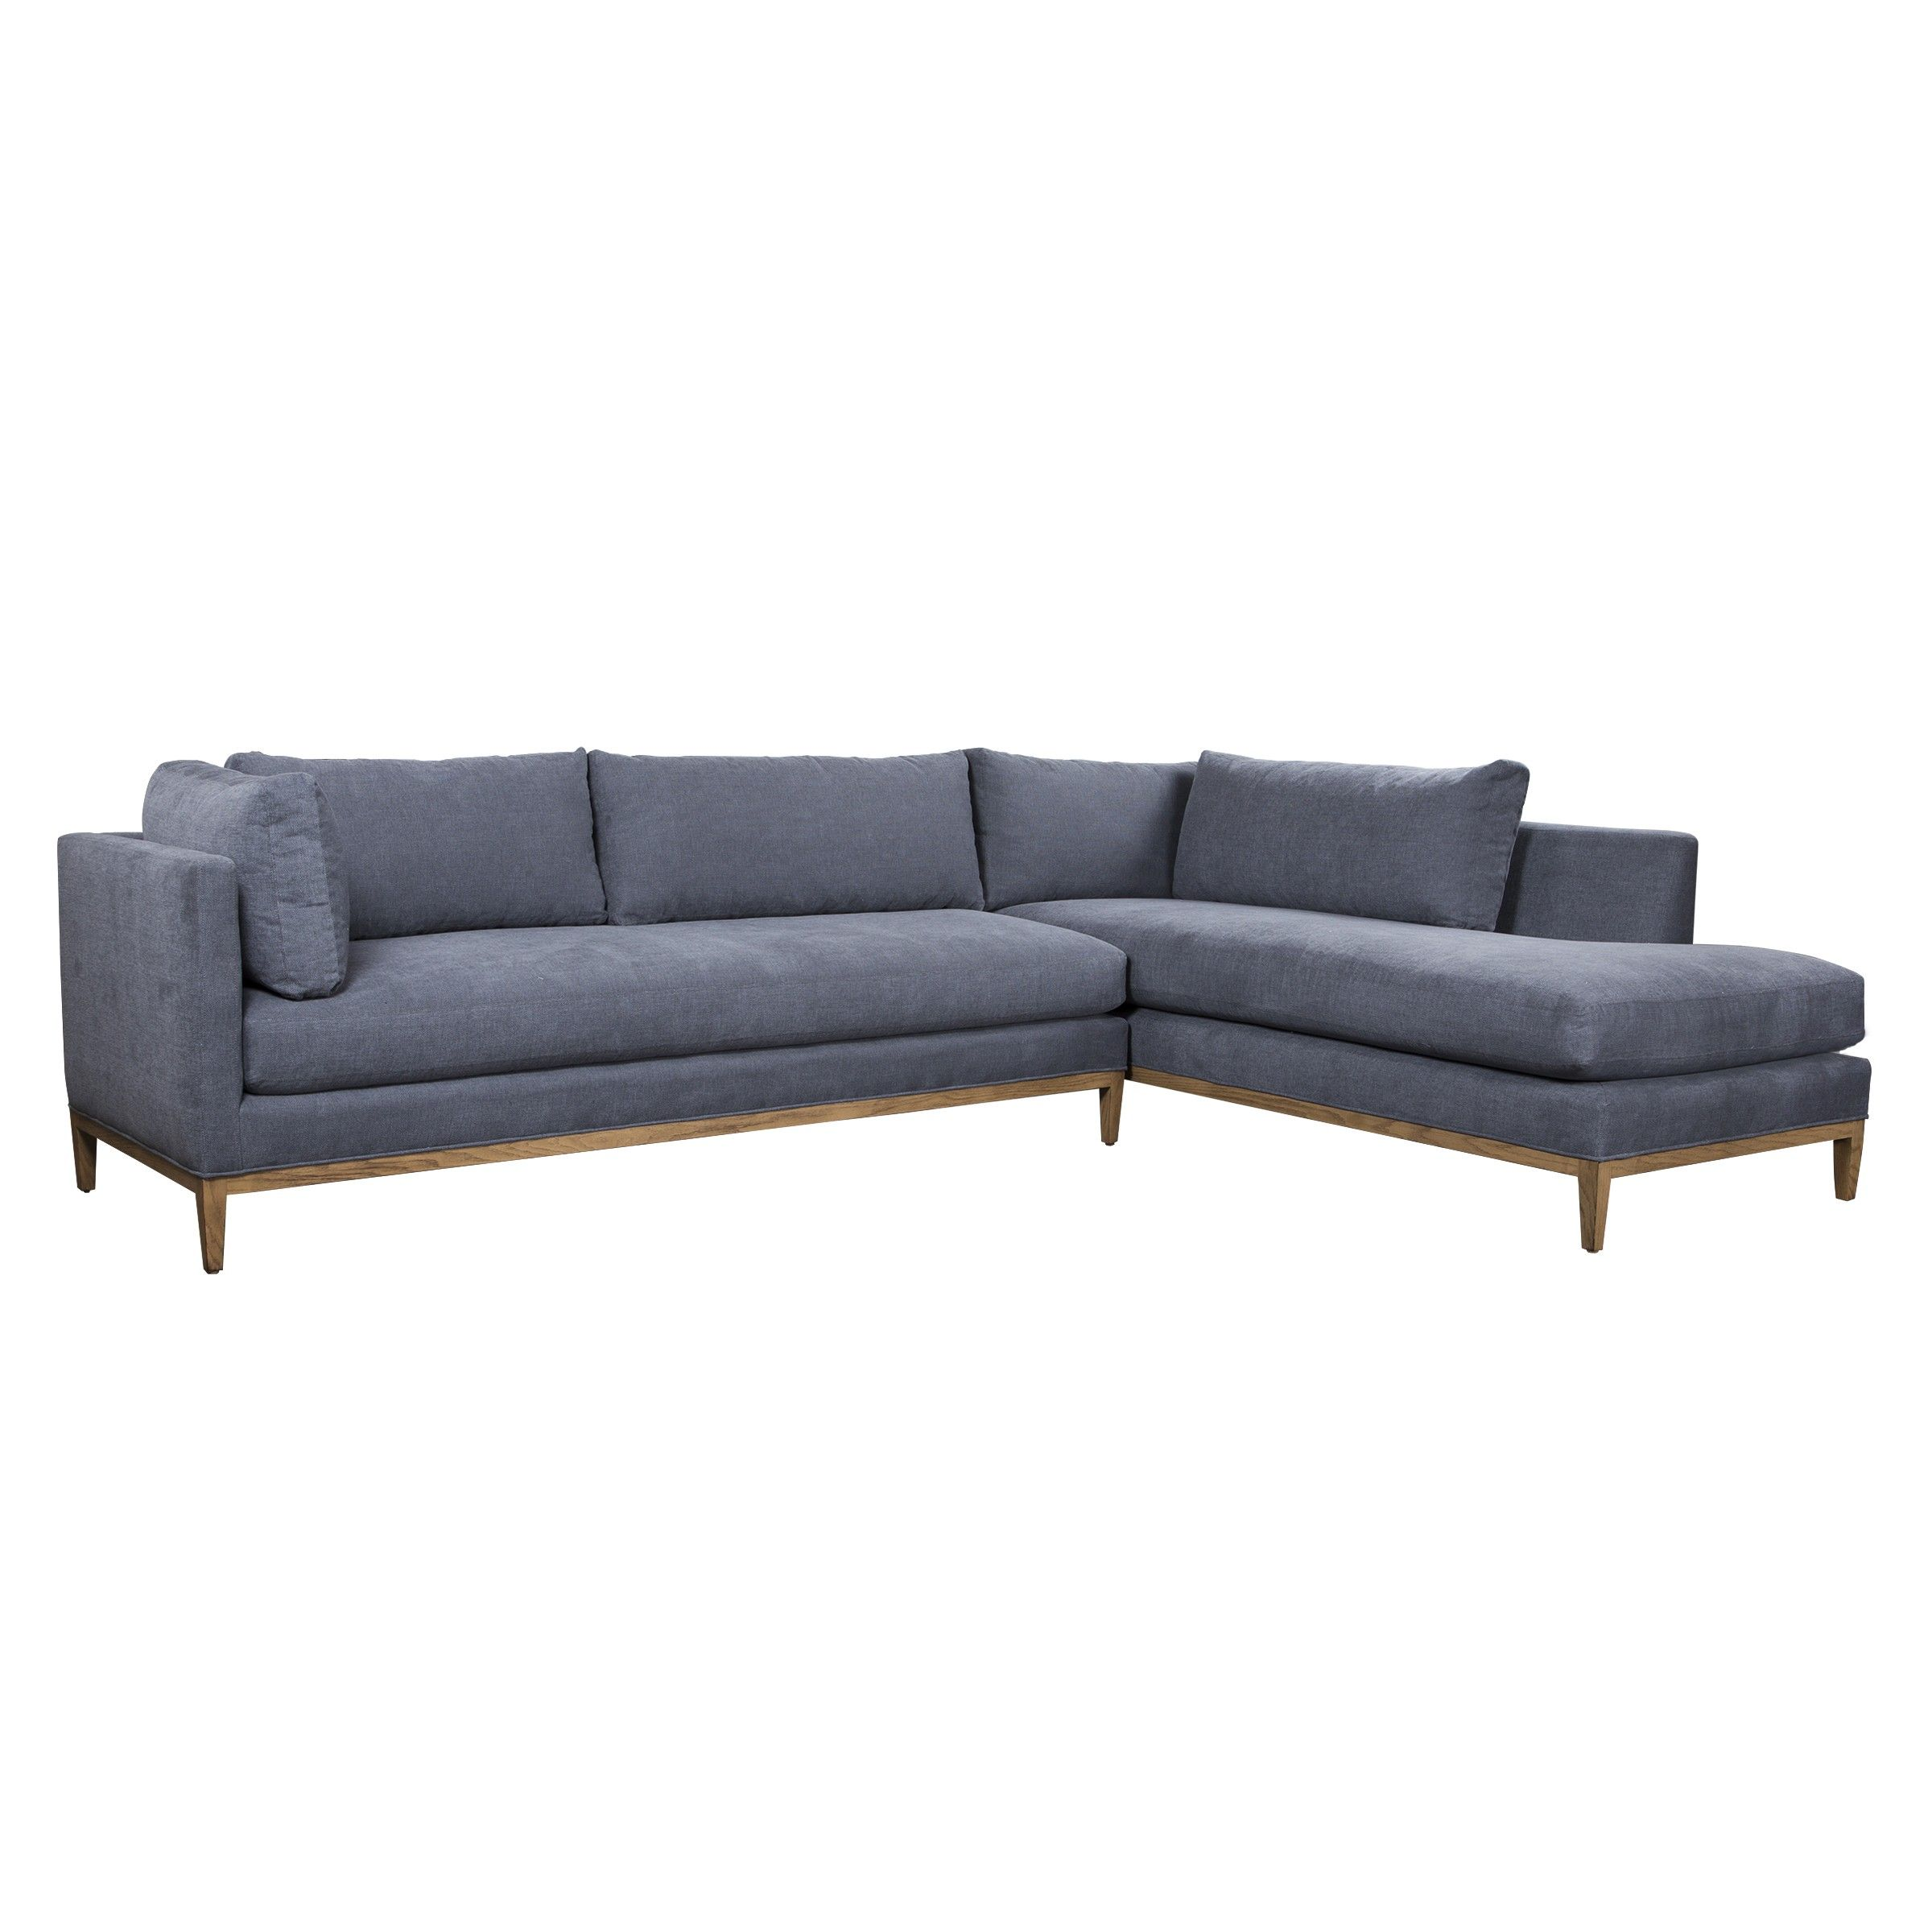 Sofa Sleeper San Francisco Tiny Leather Sofas Beds Www